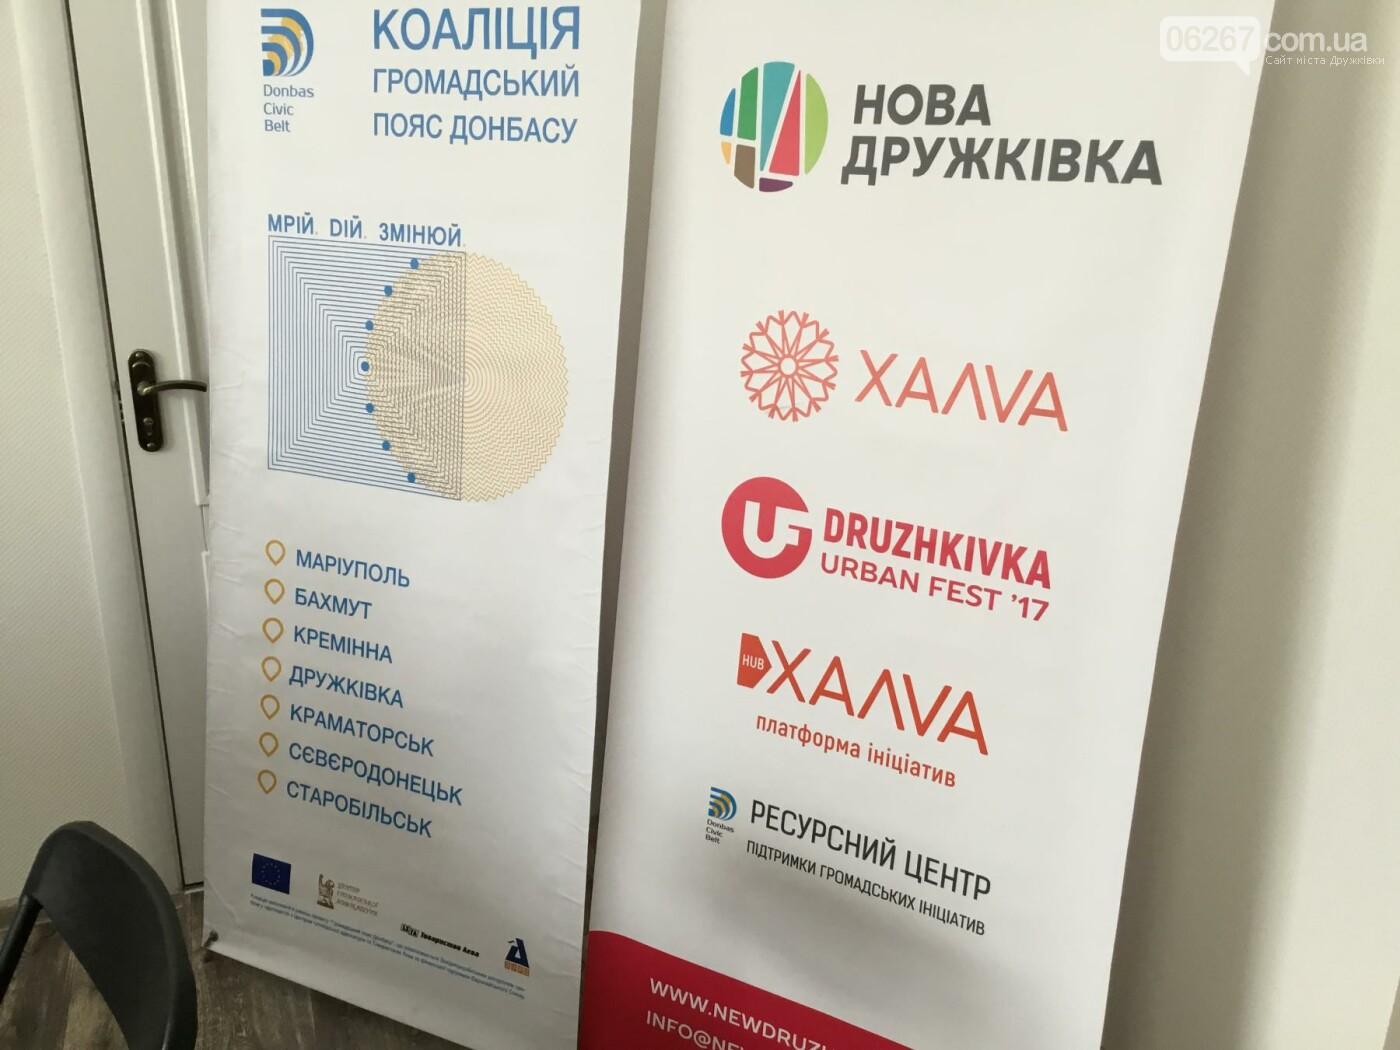 В Дружковке обсудили проблемы развития ОСМД в городе и области (ФОТО, ВИДЕО), фото-4